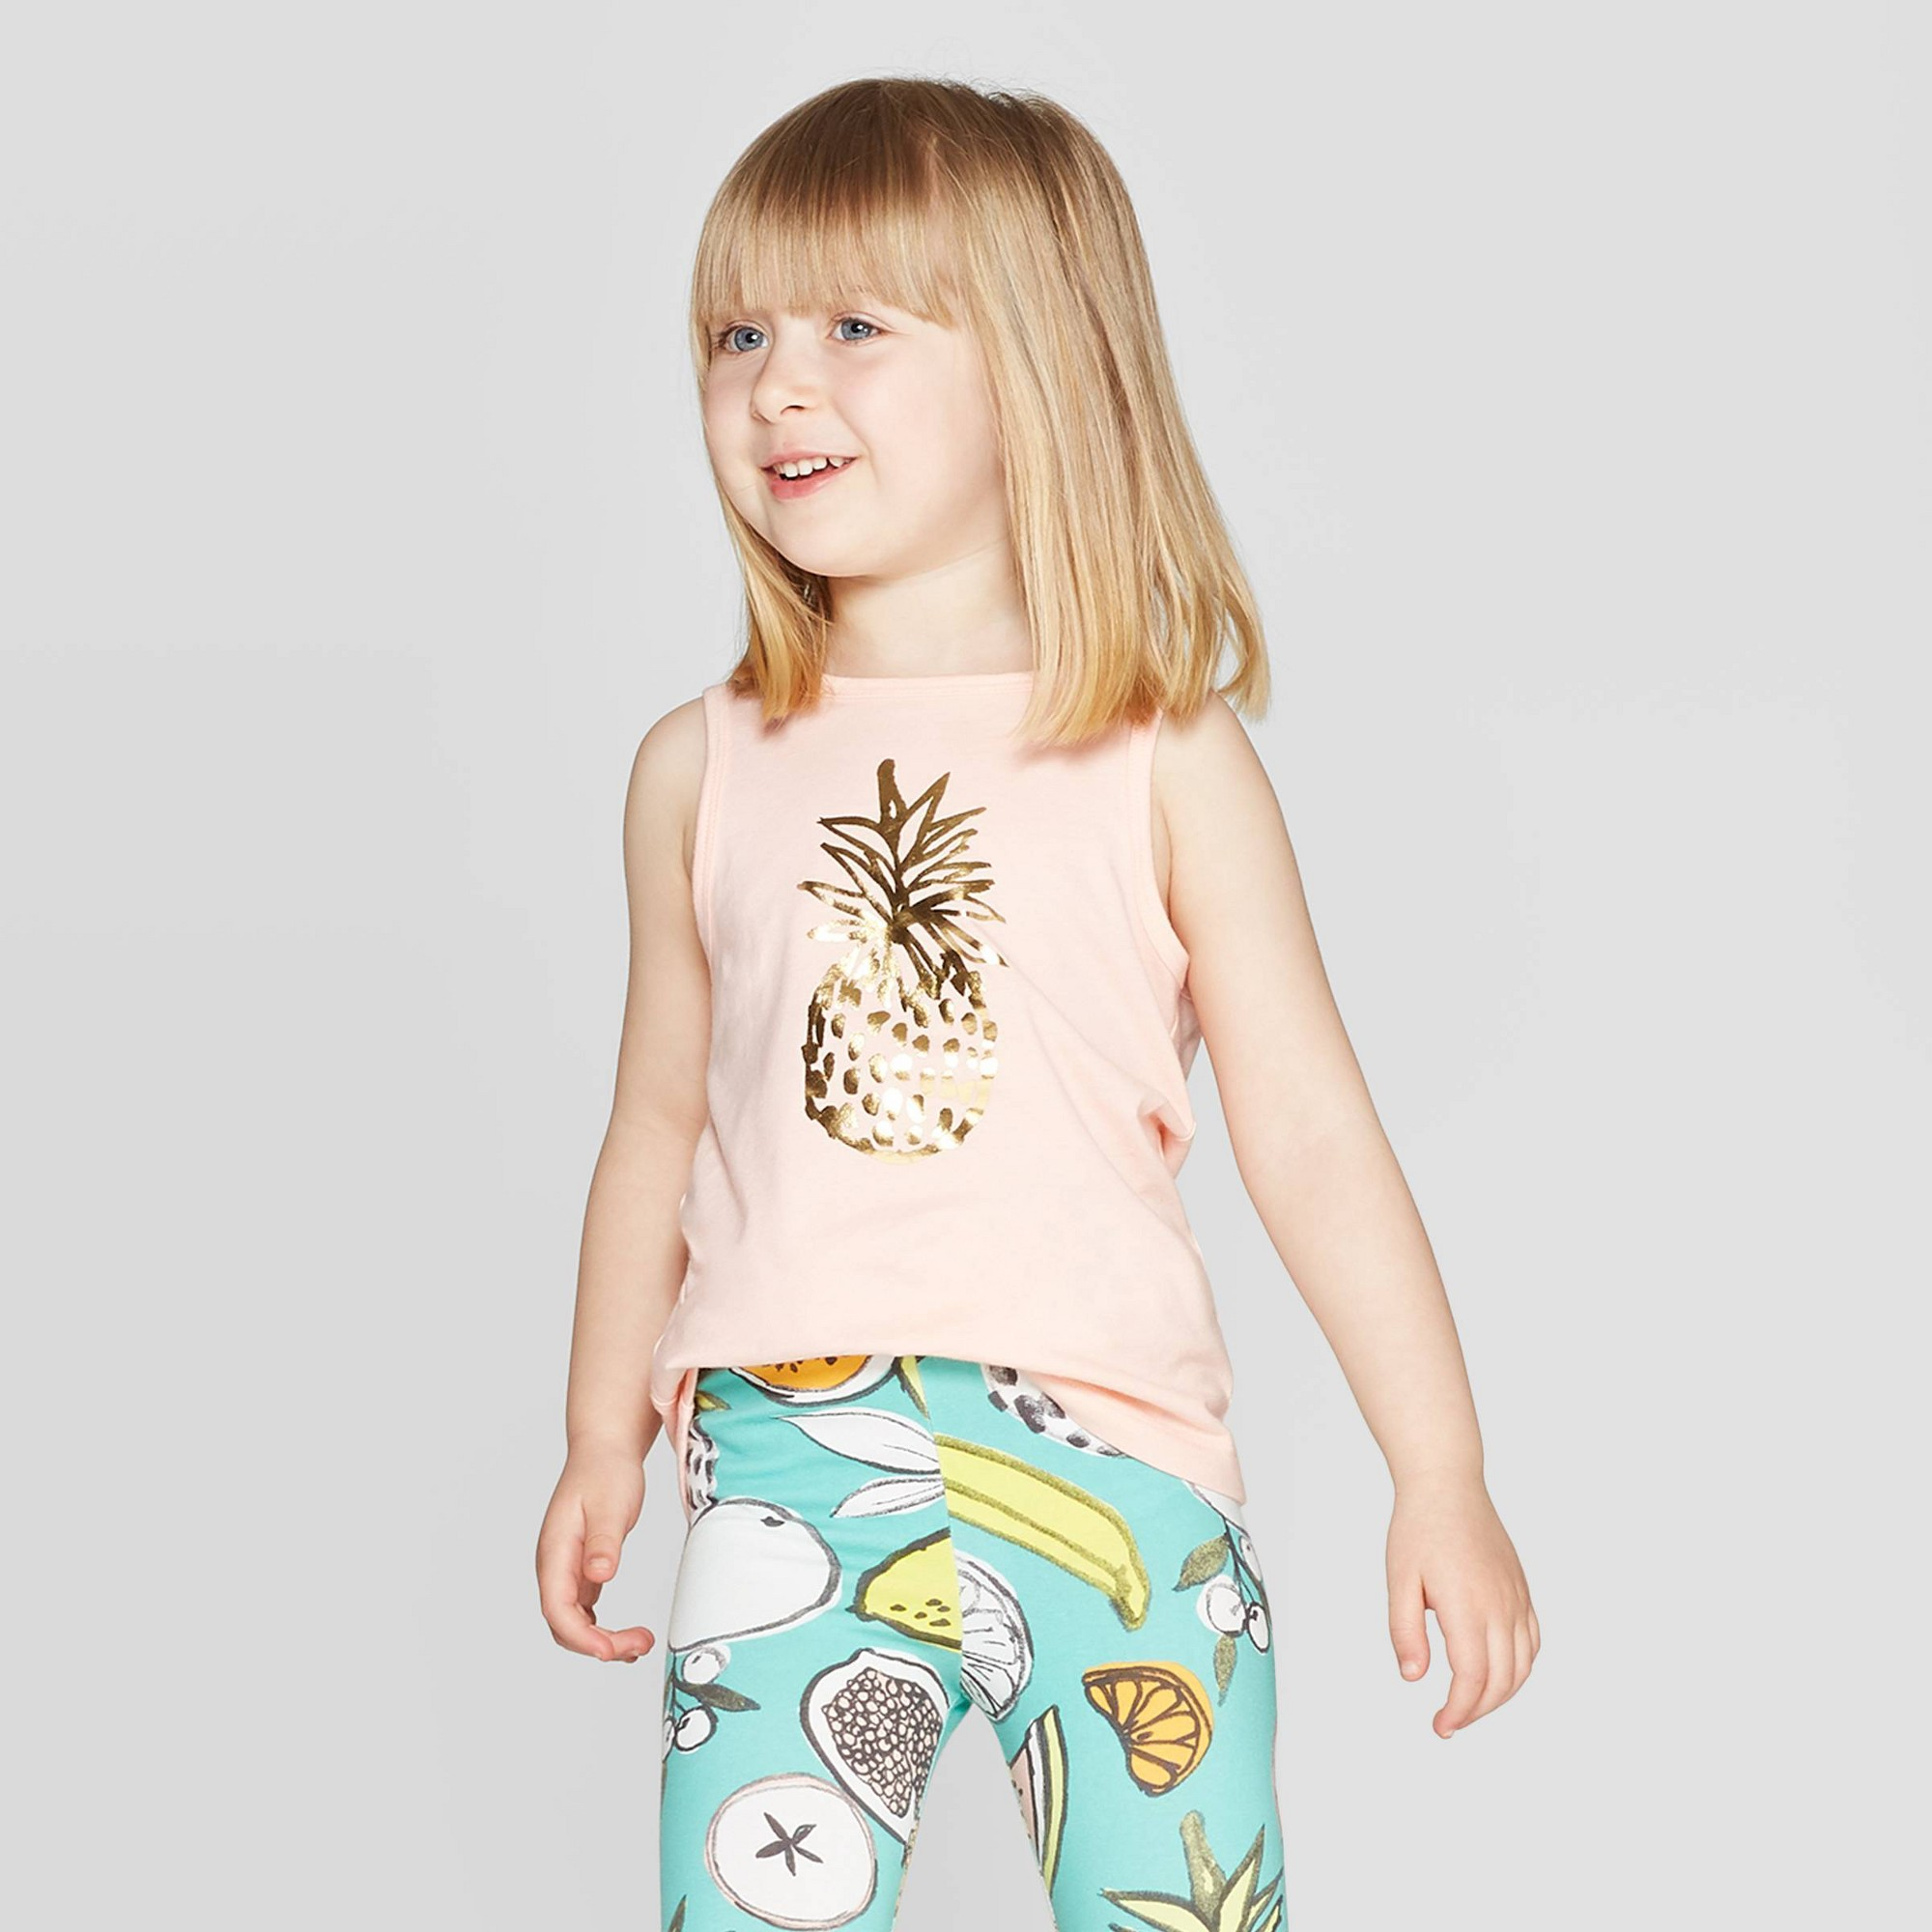 Toddler Girls' 'Fruit' Graphic Tank Top - Cat & Jack Peach 3T, Orange